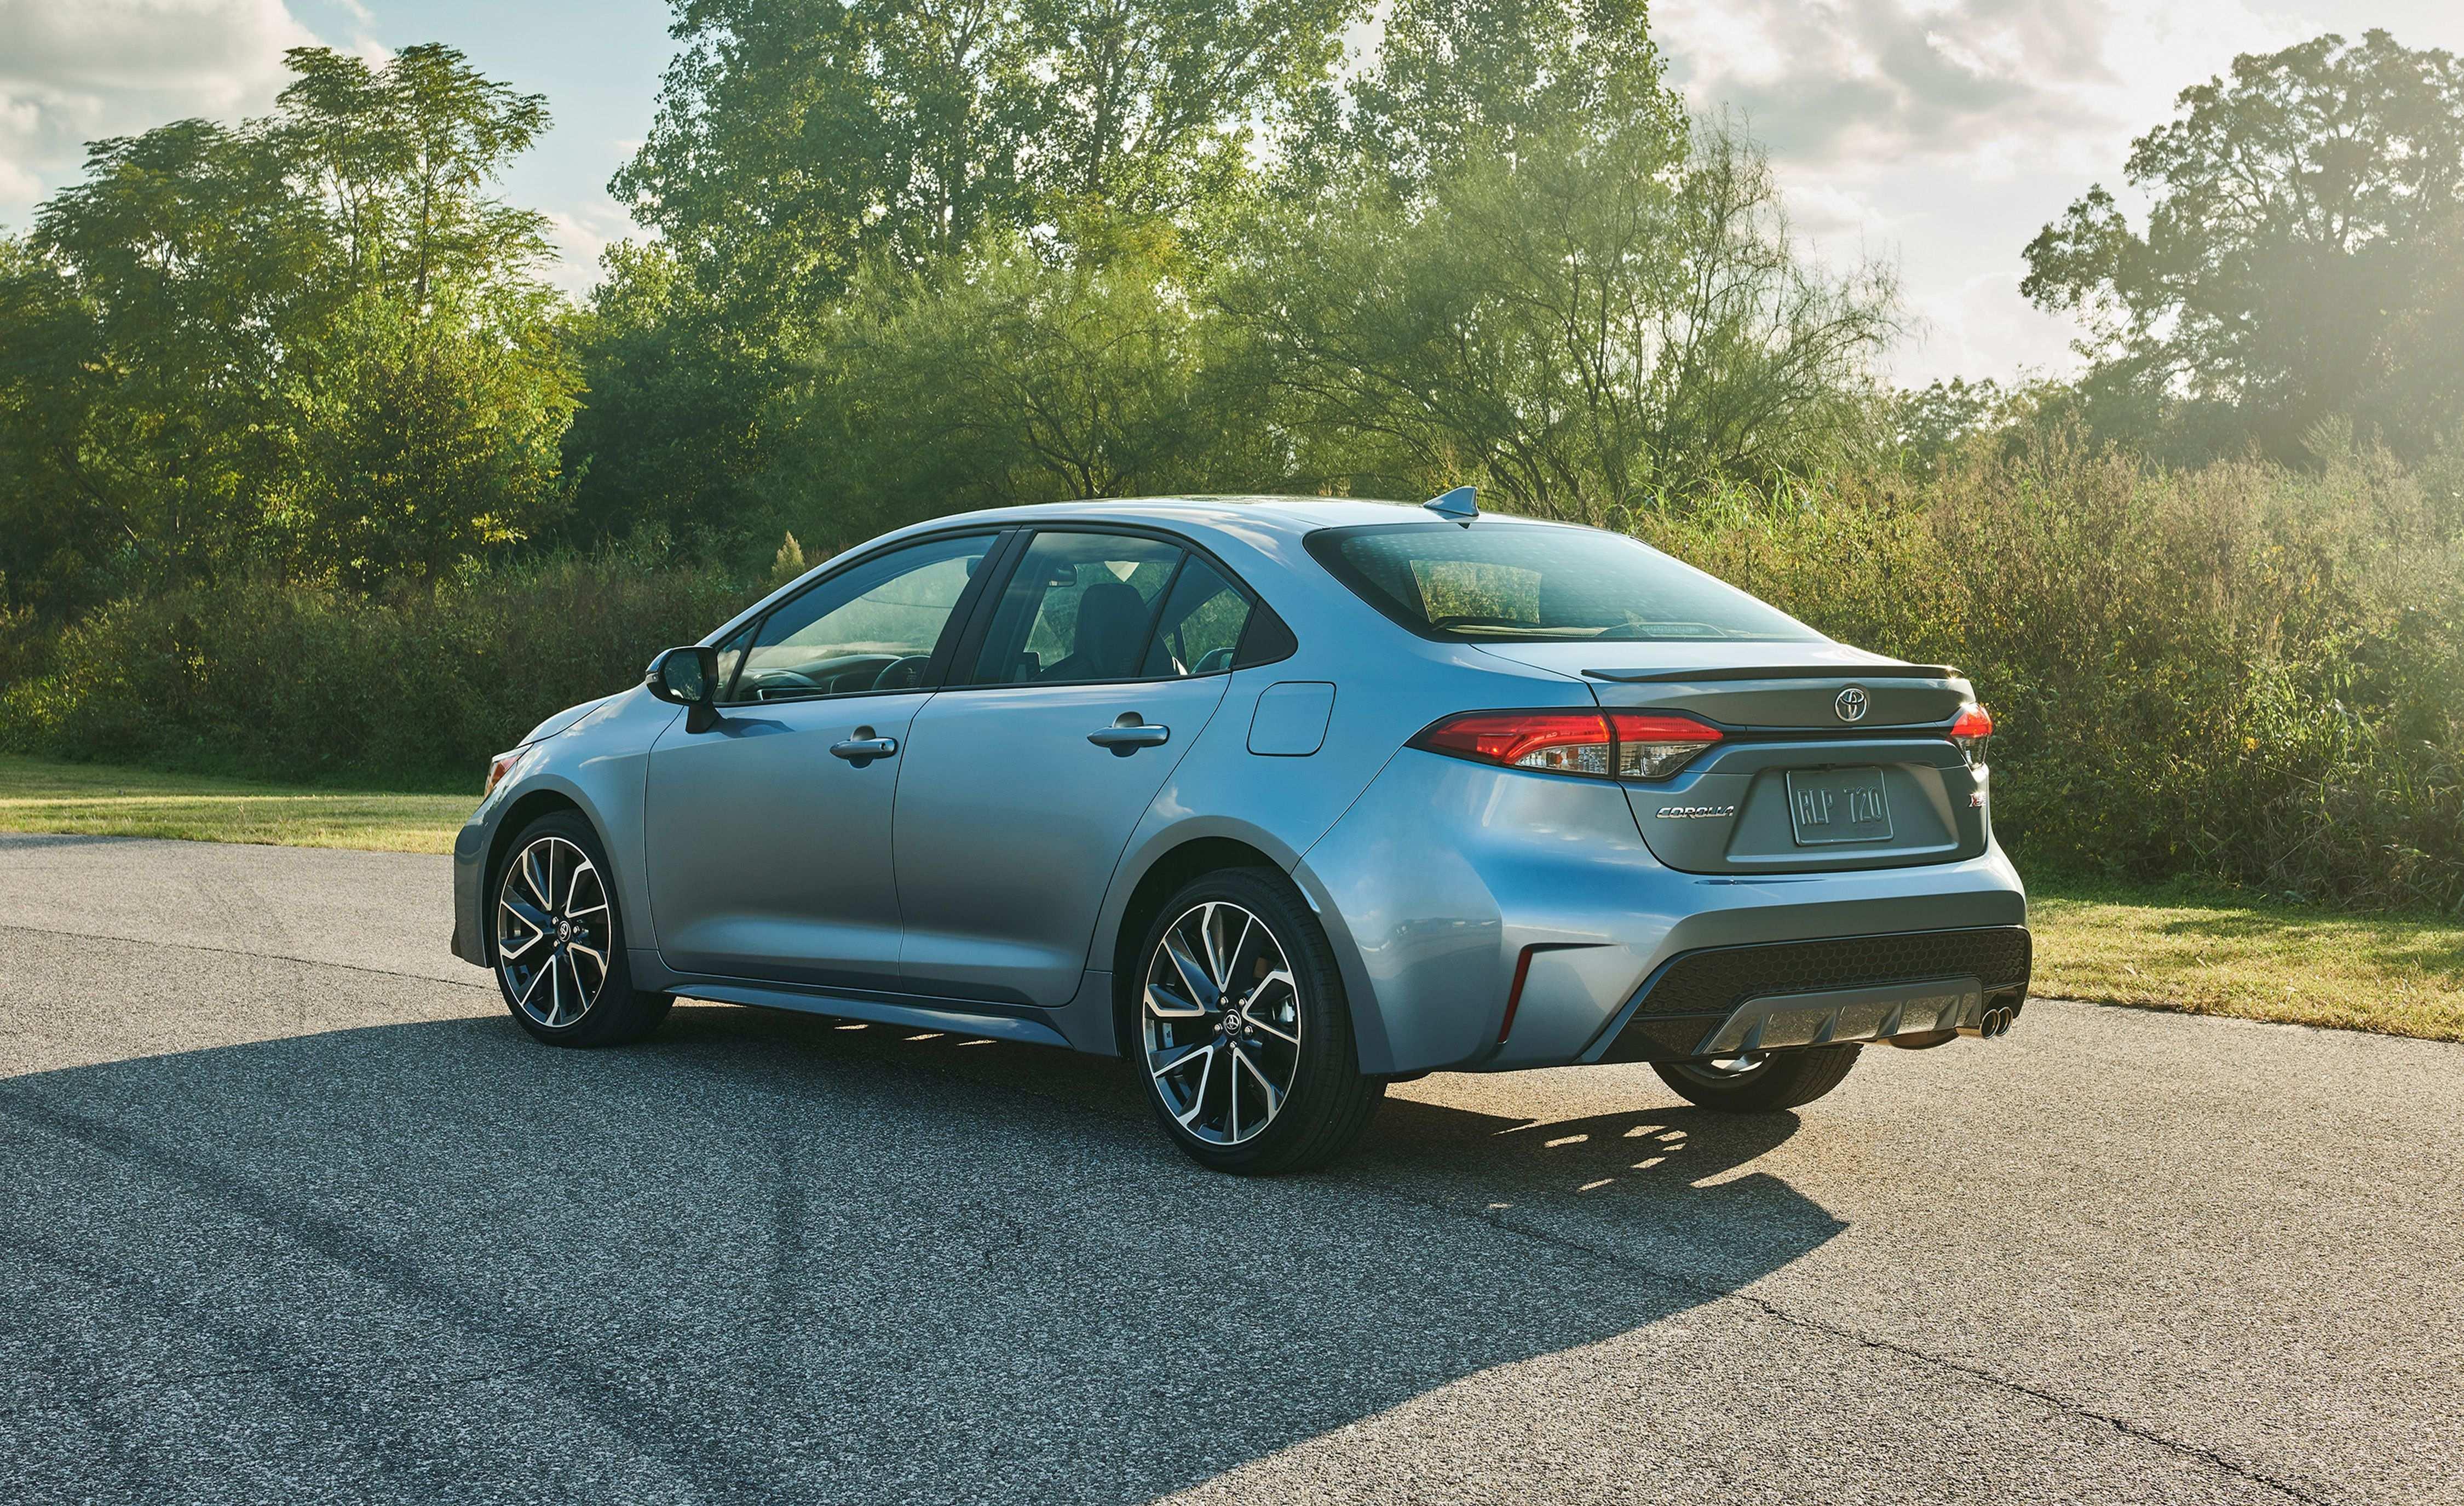 73 Great Toyota 2020 Sedan Reviews for Toyota 2020 Sedan